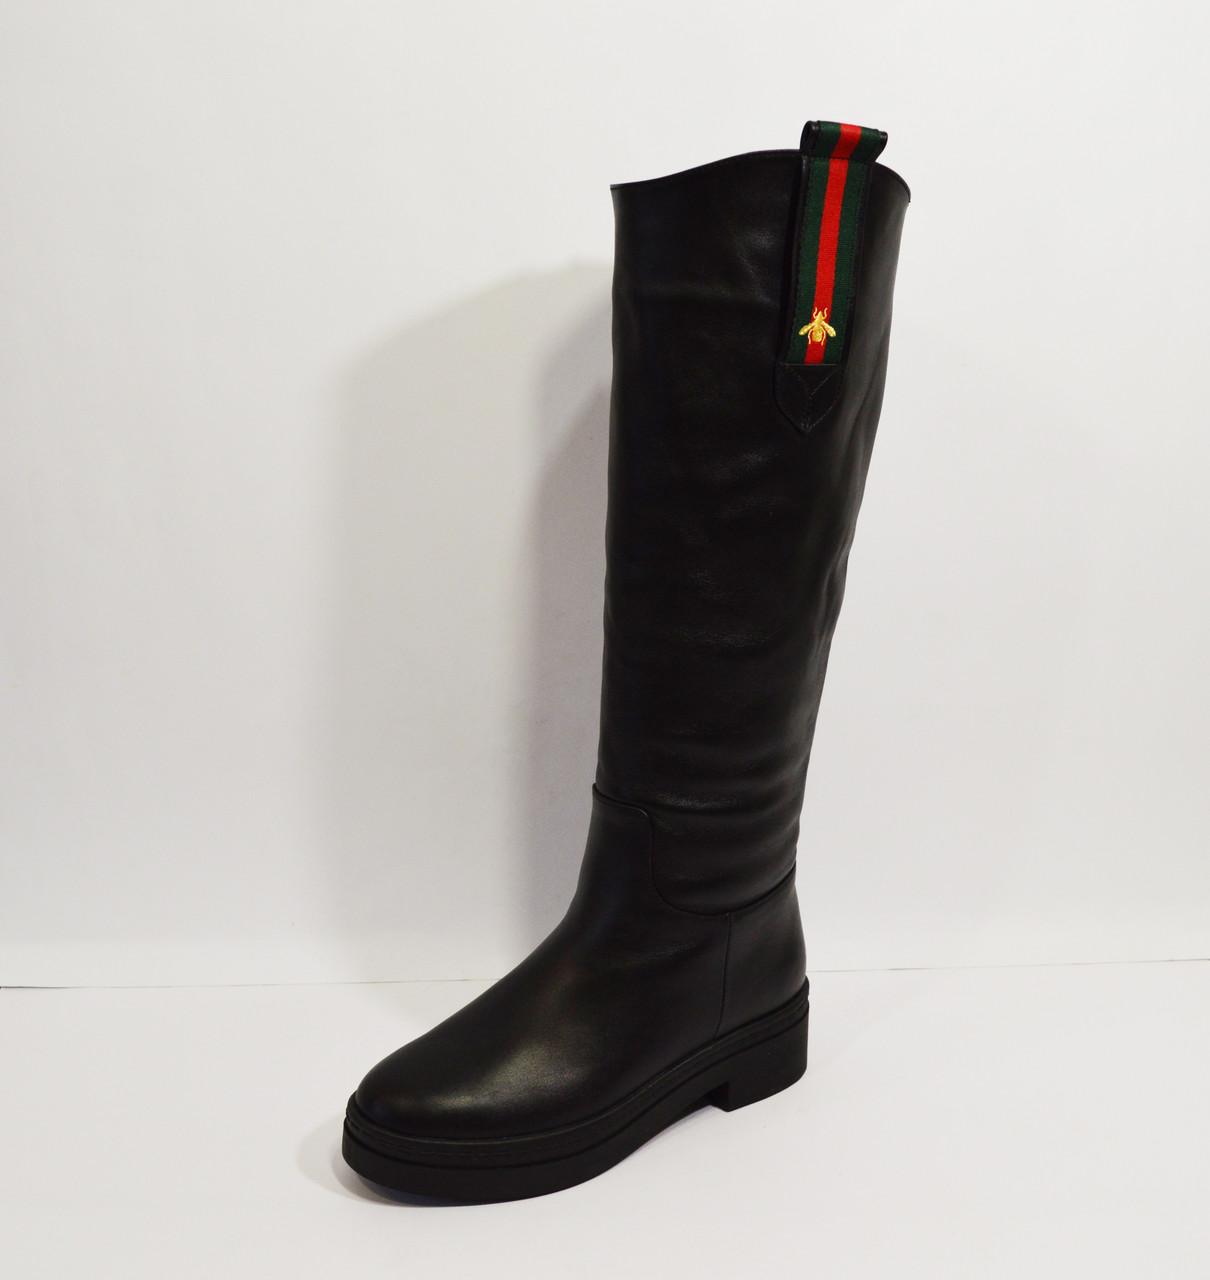 Сапоги женские зимние кожаные Kluchini - КРЕЩАТИК - интернет магазин обуви  в Александрии 6745e75b92948